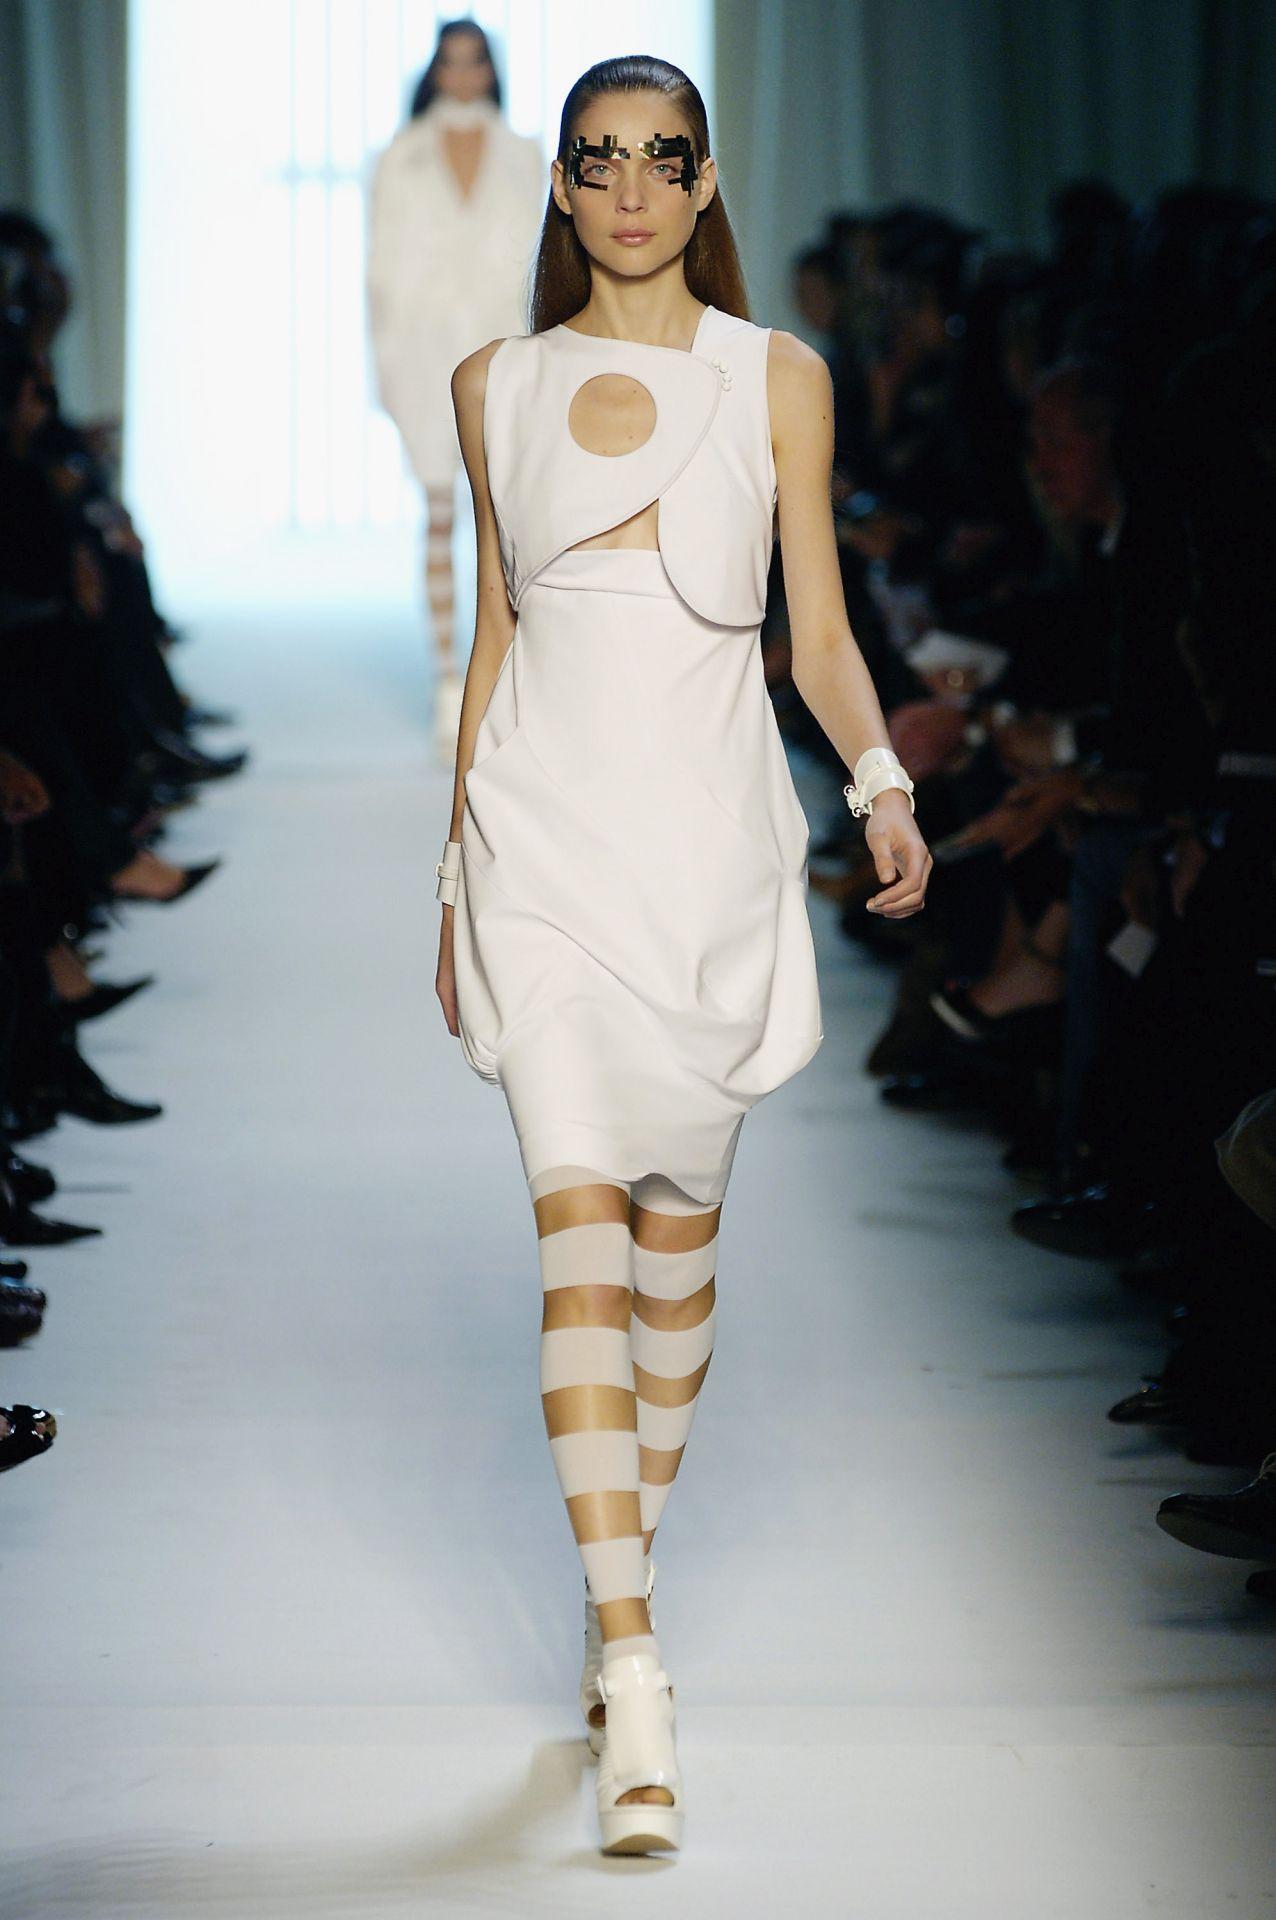 2. kép: Cutout ruha - Givenchy 2007  (Fotó: Chris Moore/Catwalking/Getty Images)